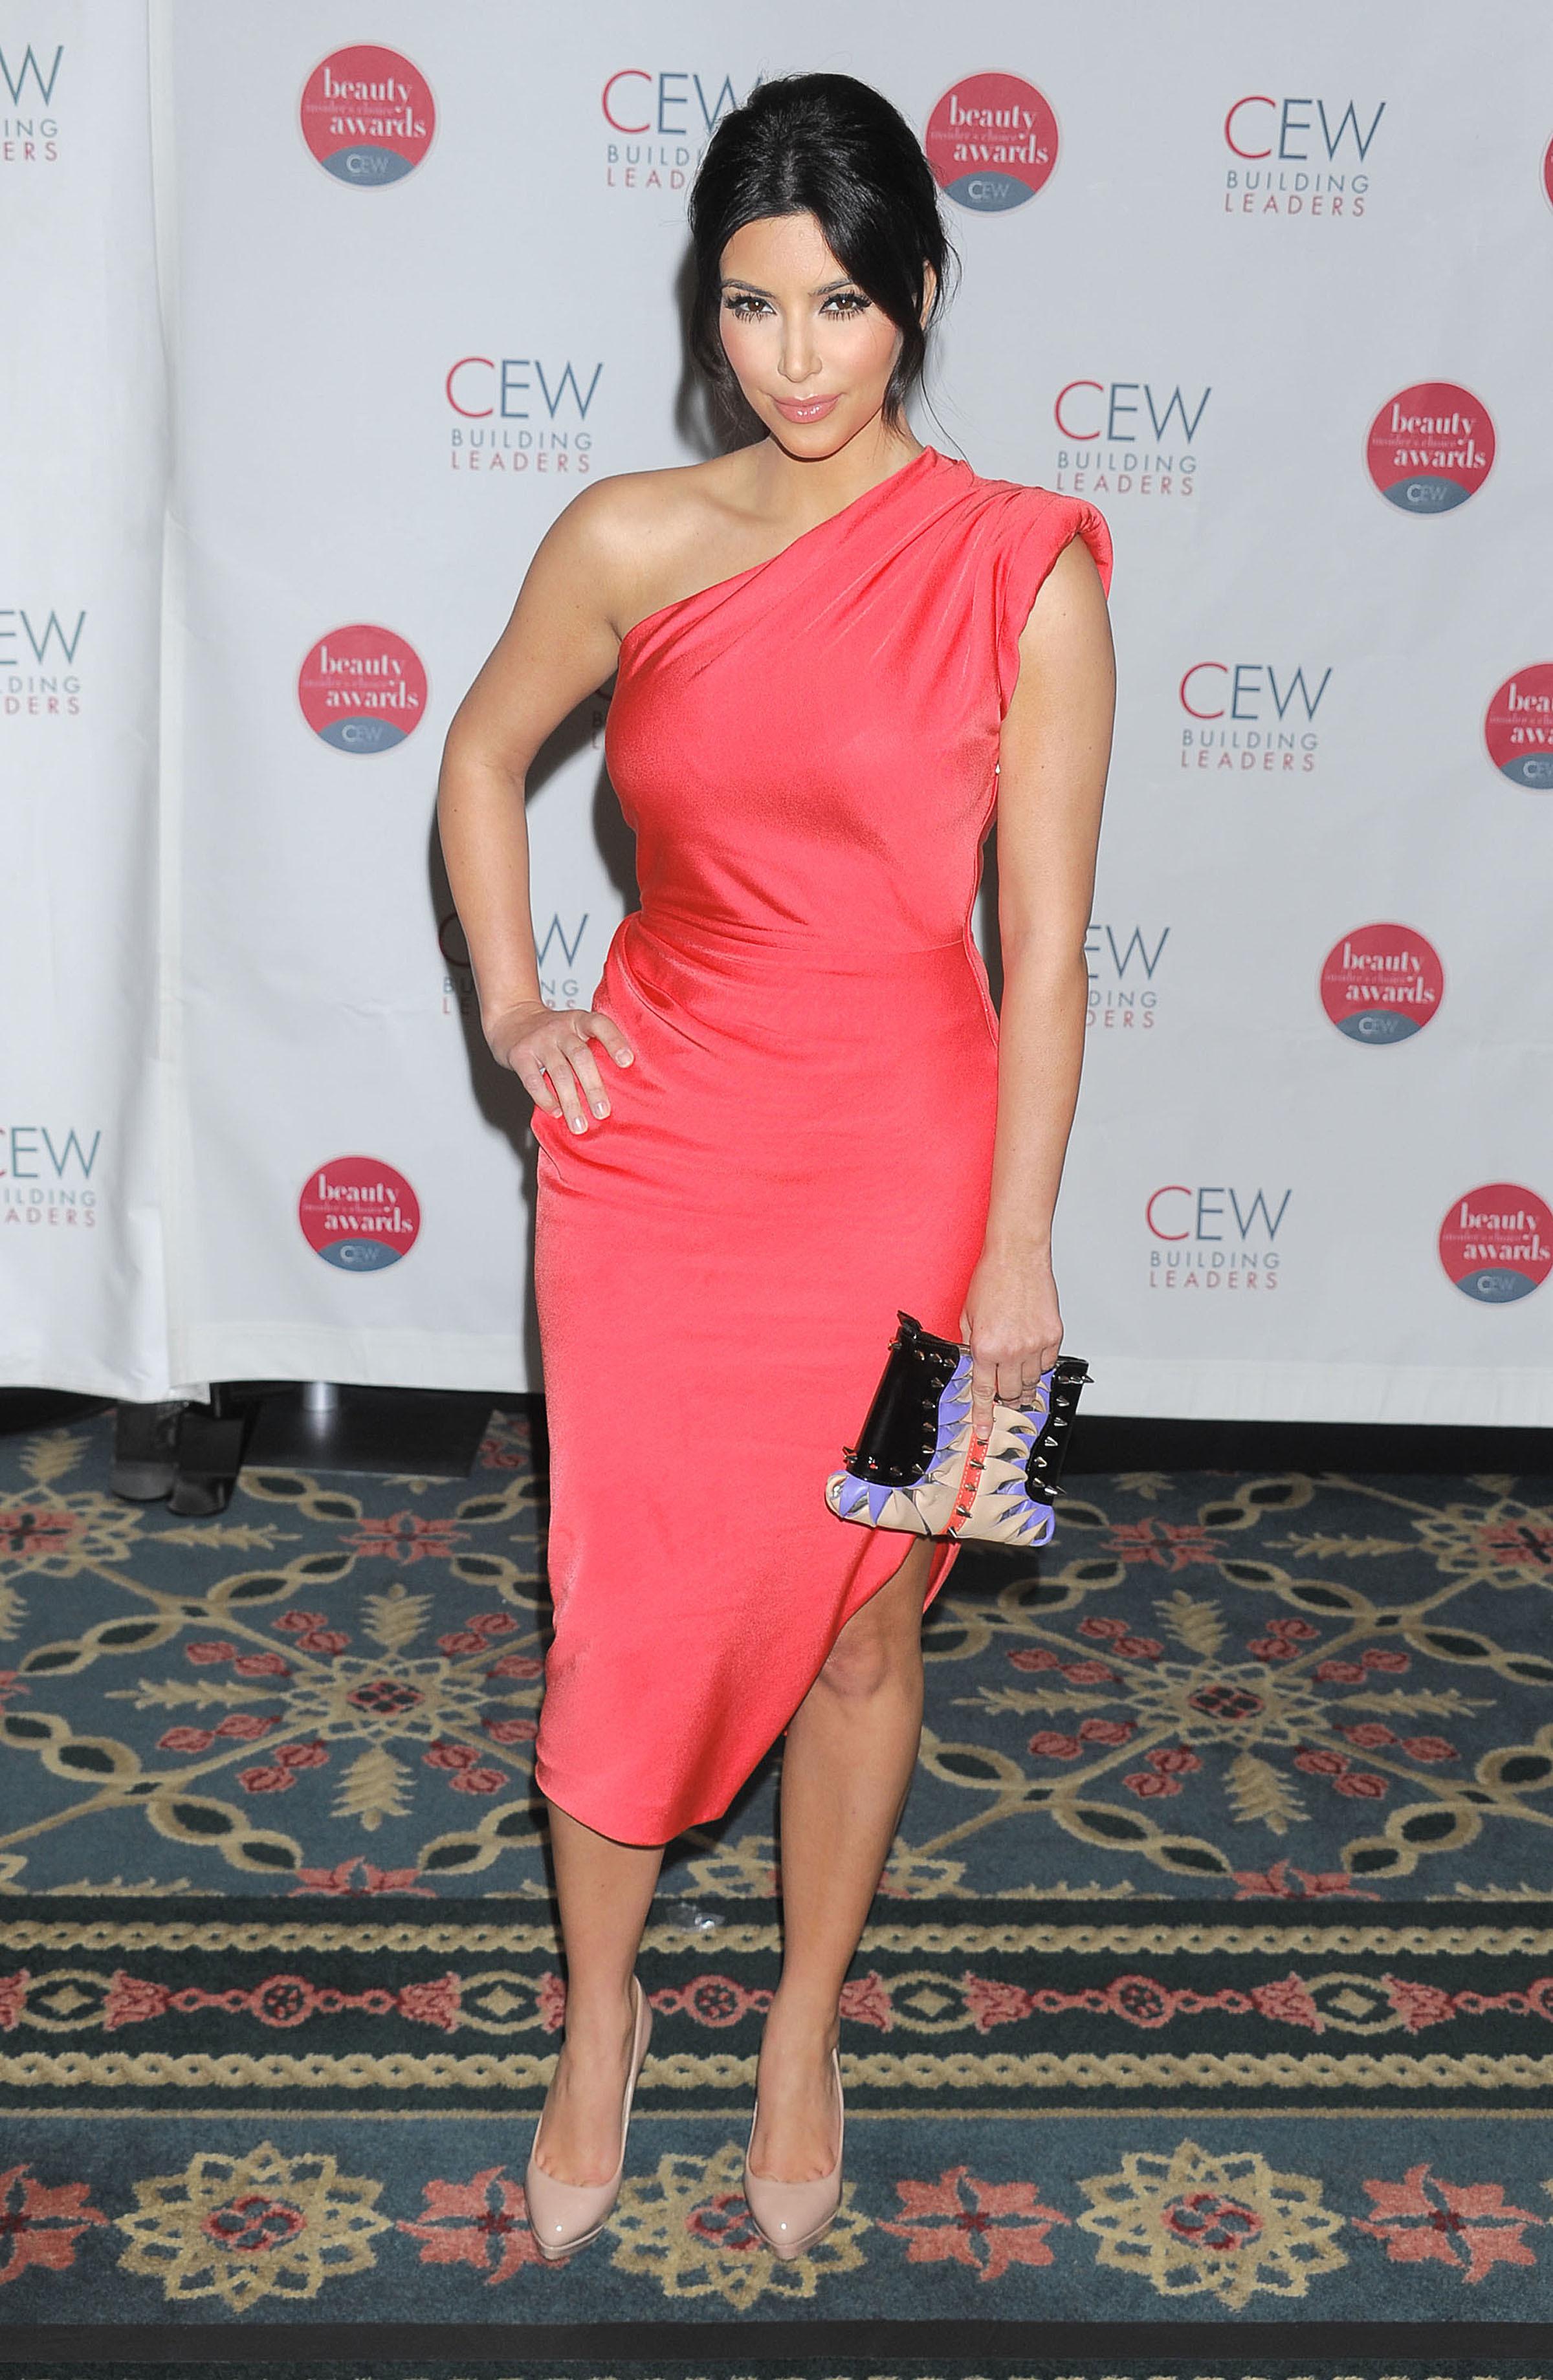 kim kardashian tyra banks rachel roy dress